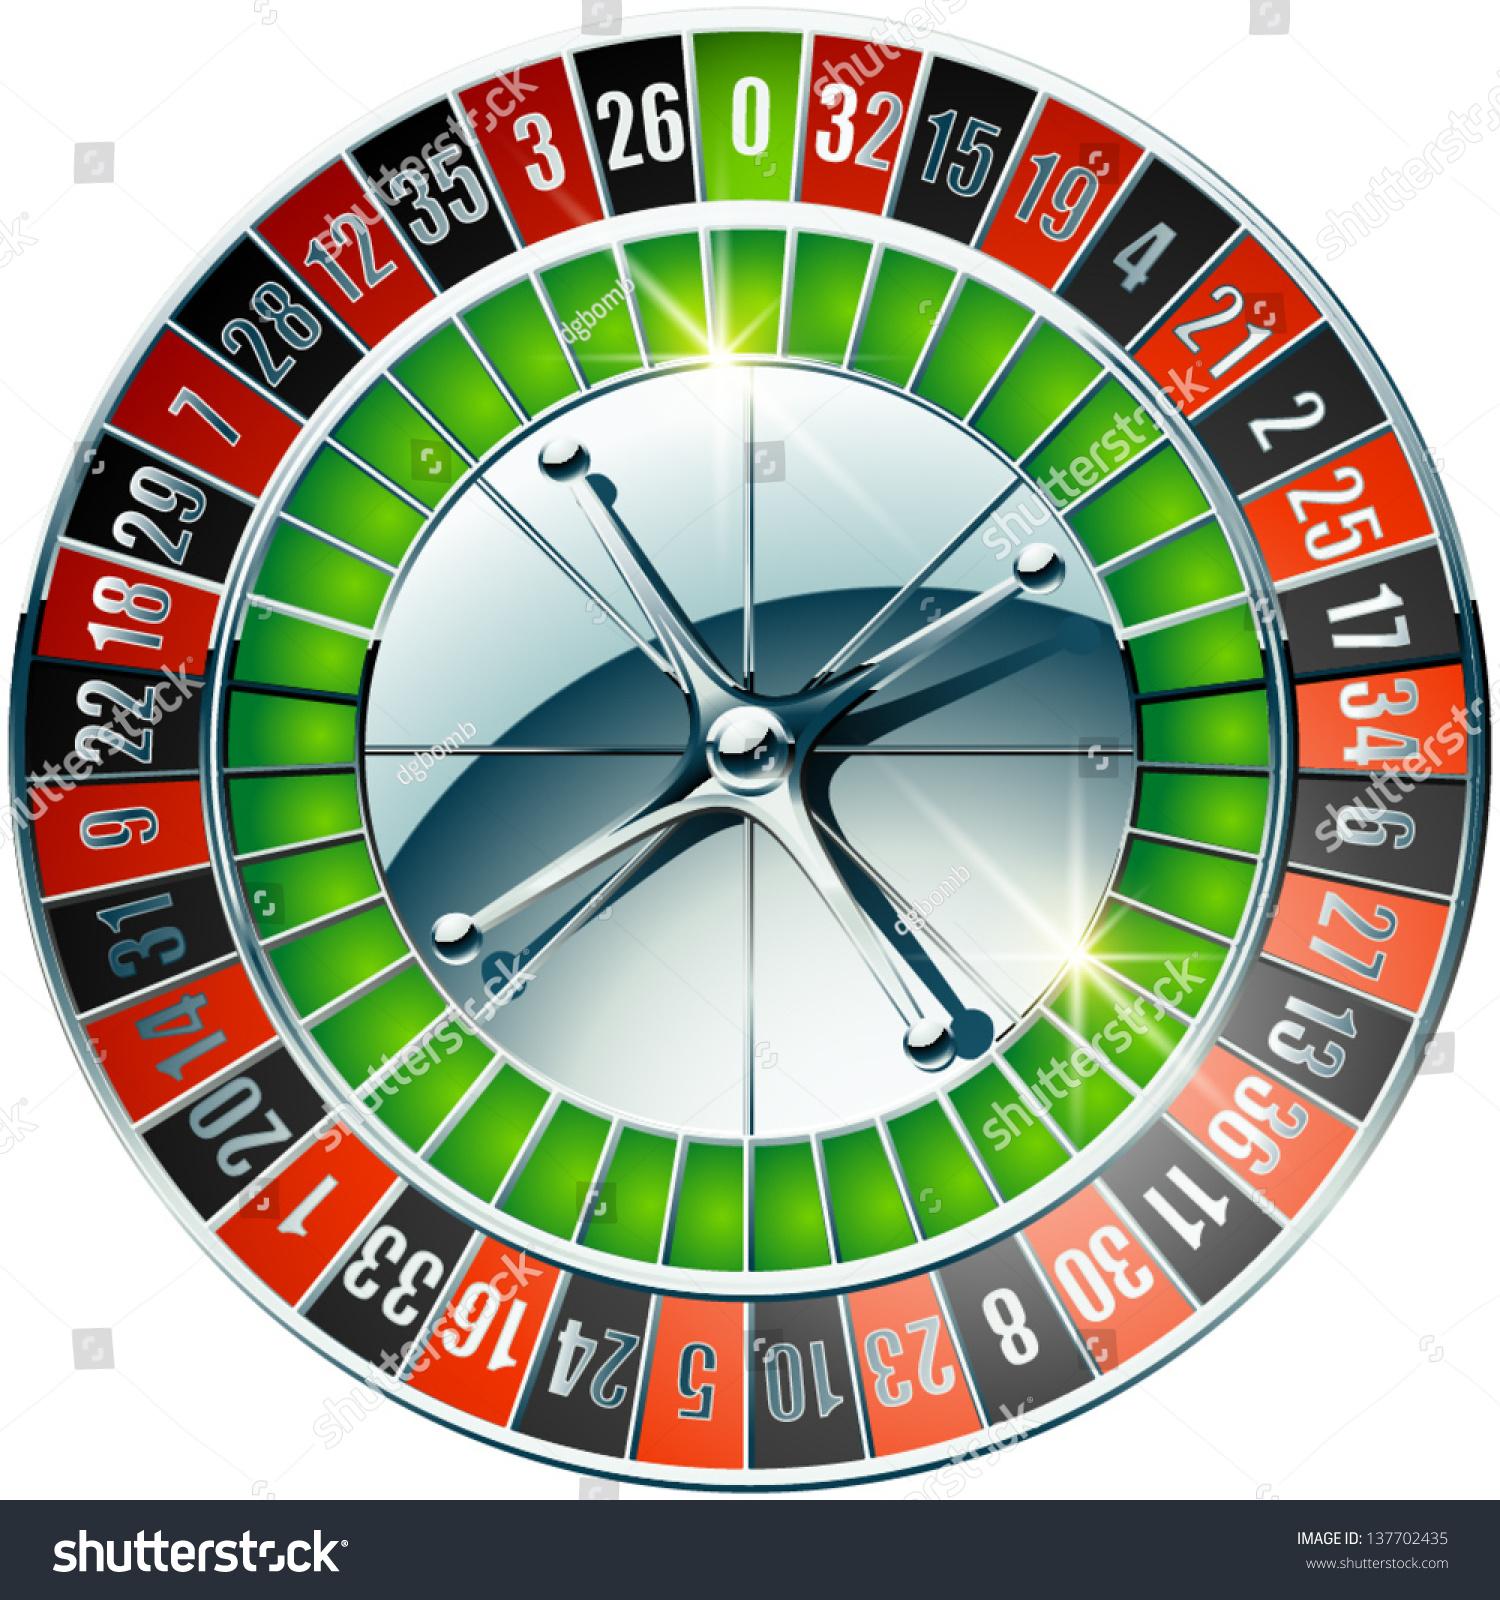 online slots-play 5 reel slot games at ladbrokescasino.com